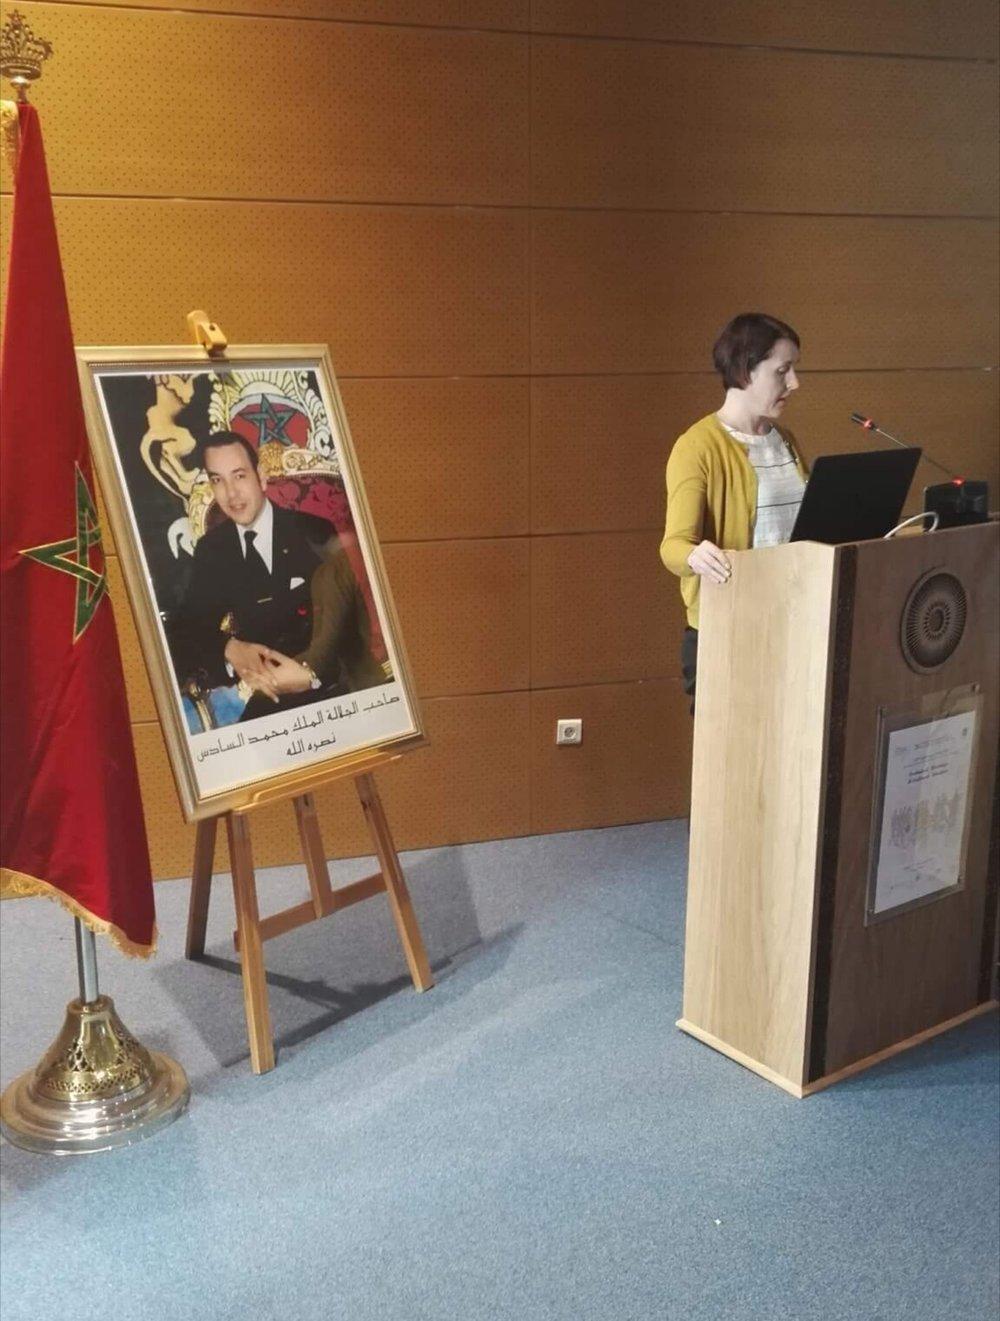 CNRST –tutkimuskeskus tarjosi konferenssille juhlalliset puitteet.